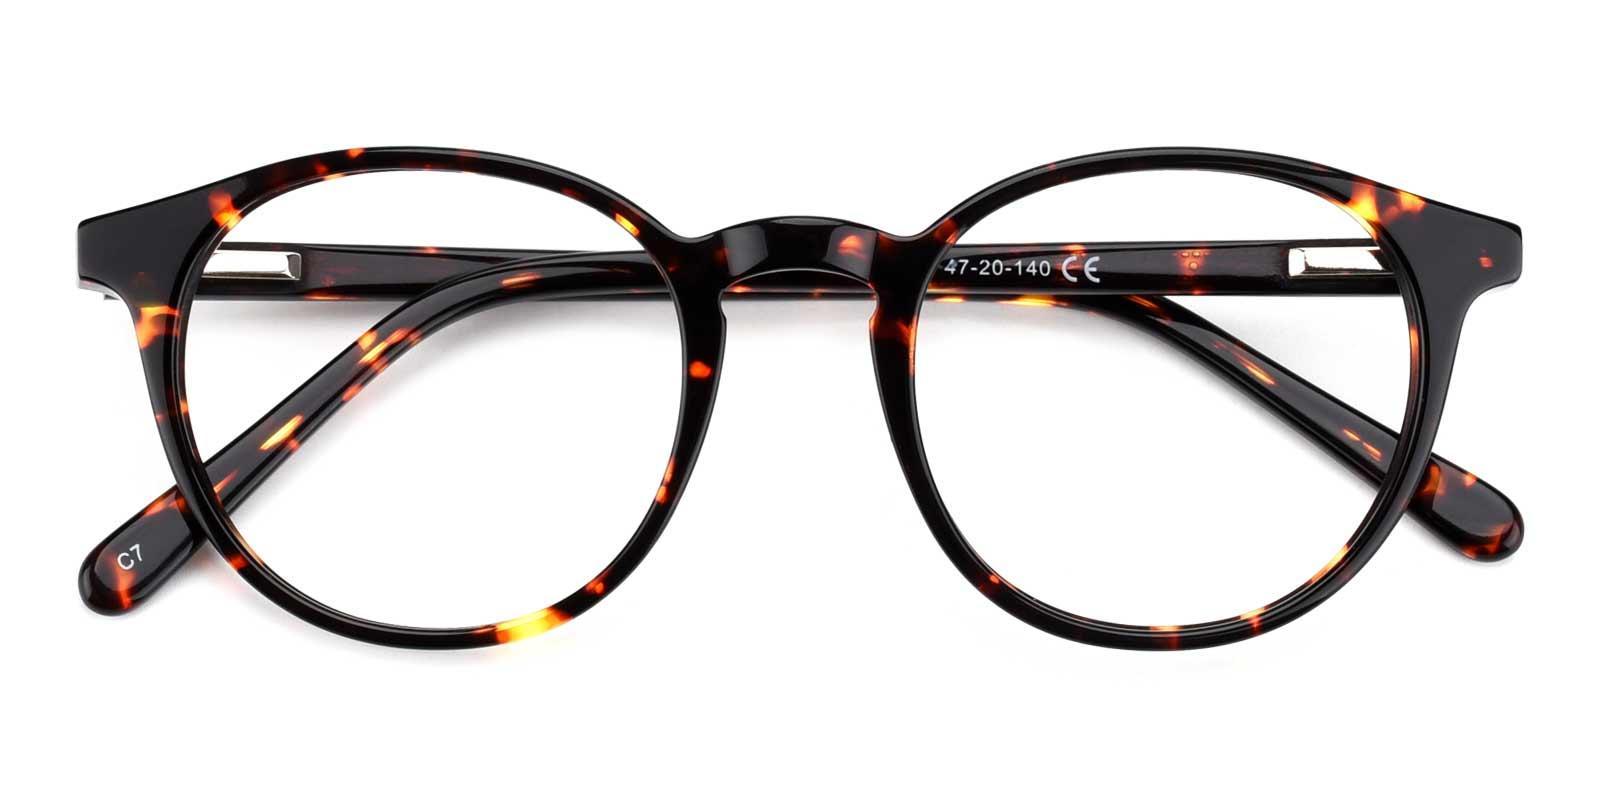 Angie-Tortoise-Round-Acetate-Eyeglasses-detail